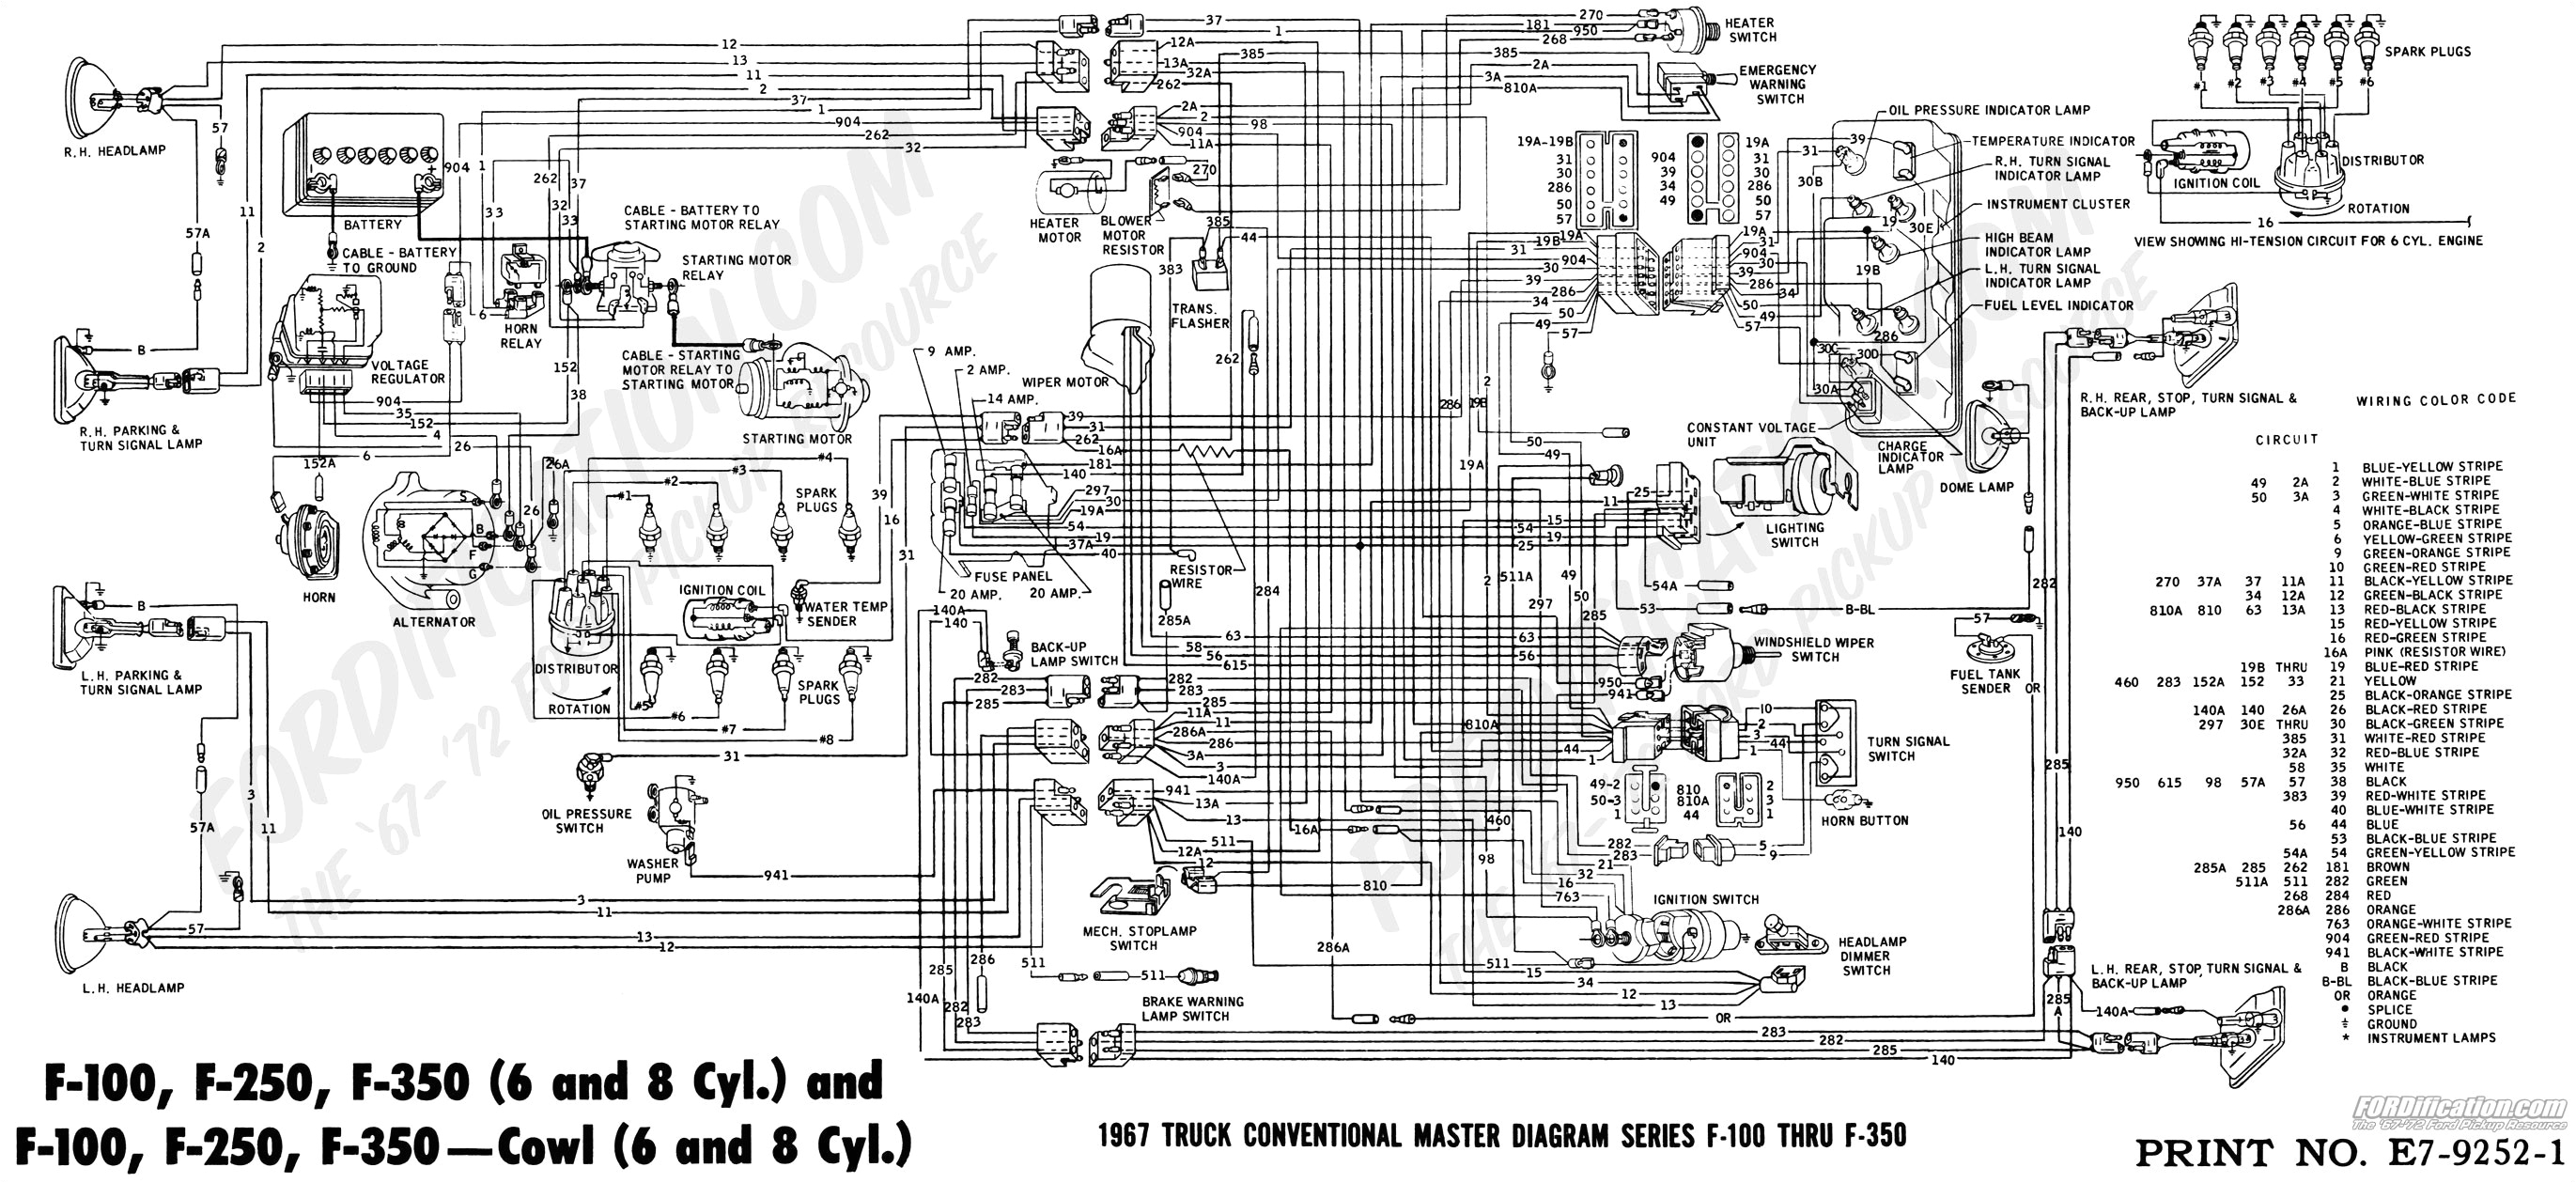 diagram 94 ford bronco wiring diagram name 1992 ford bronco fuse diagram 1992 ford bronco fuse diagram